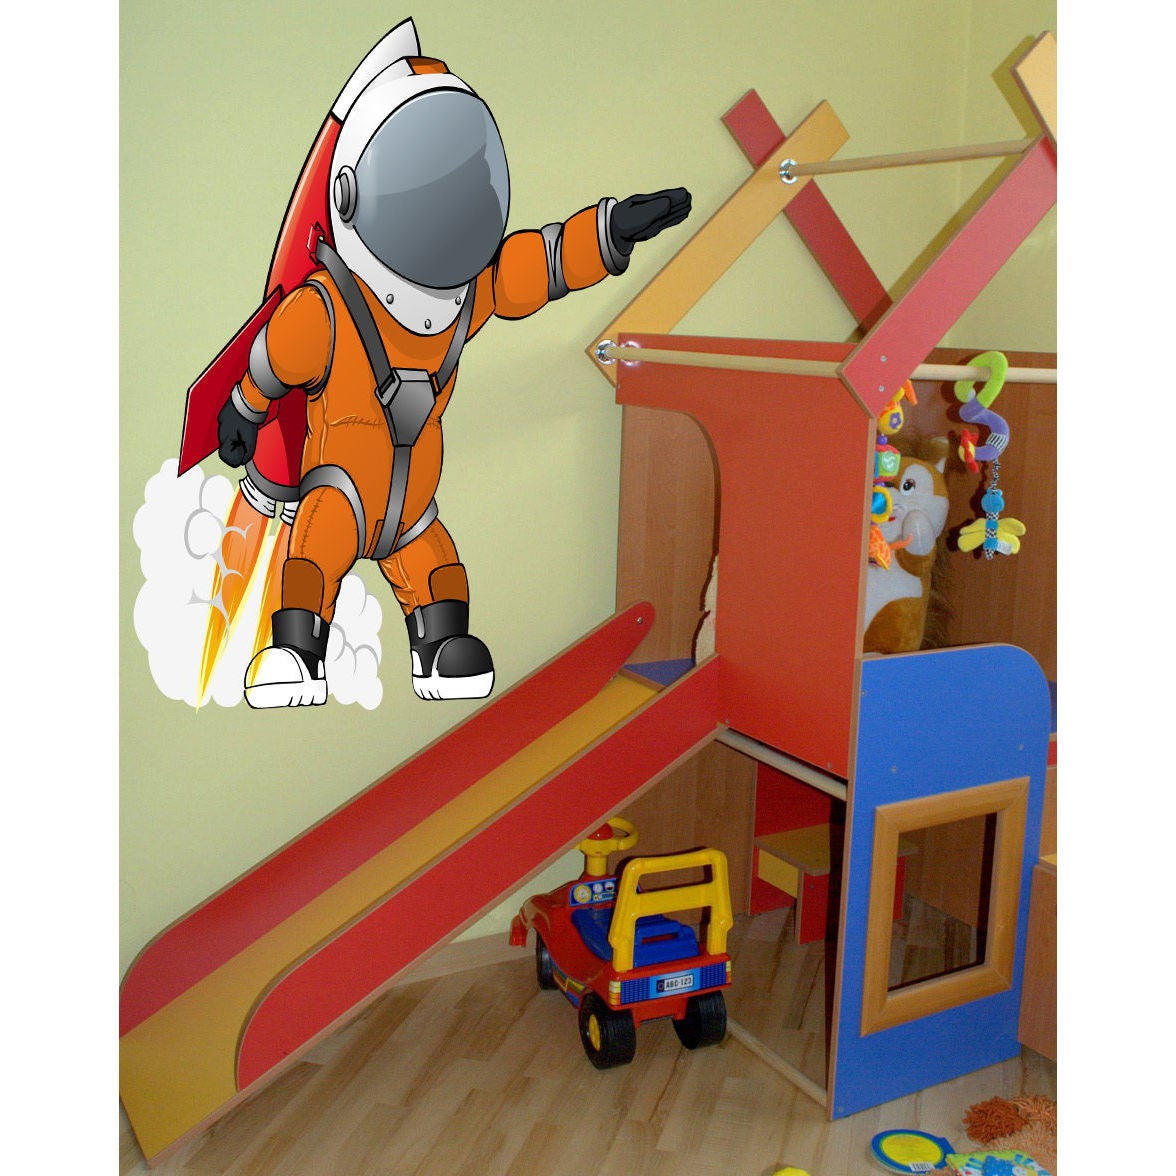 Fireman vinyl wall sticker decal bedroom nursery deco emergency hero removable